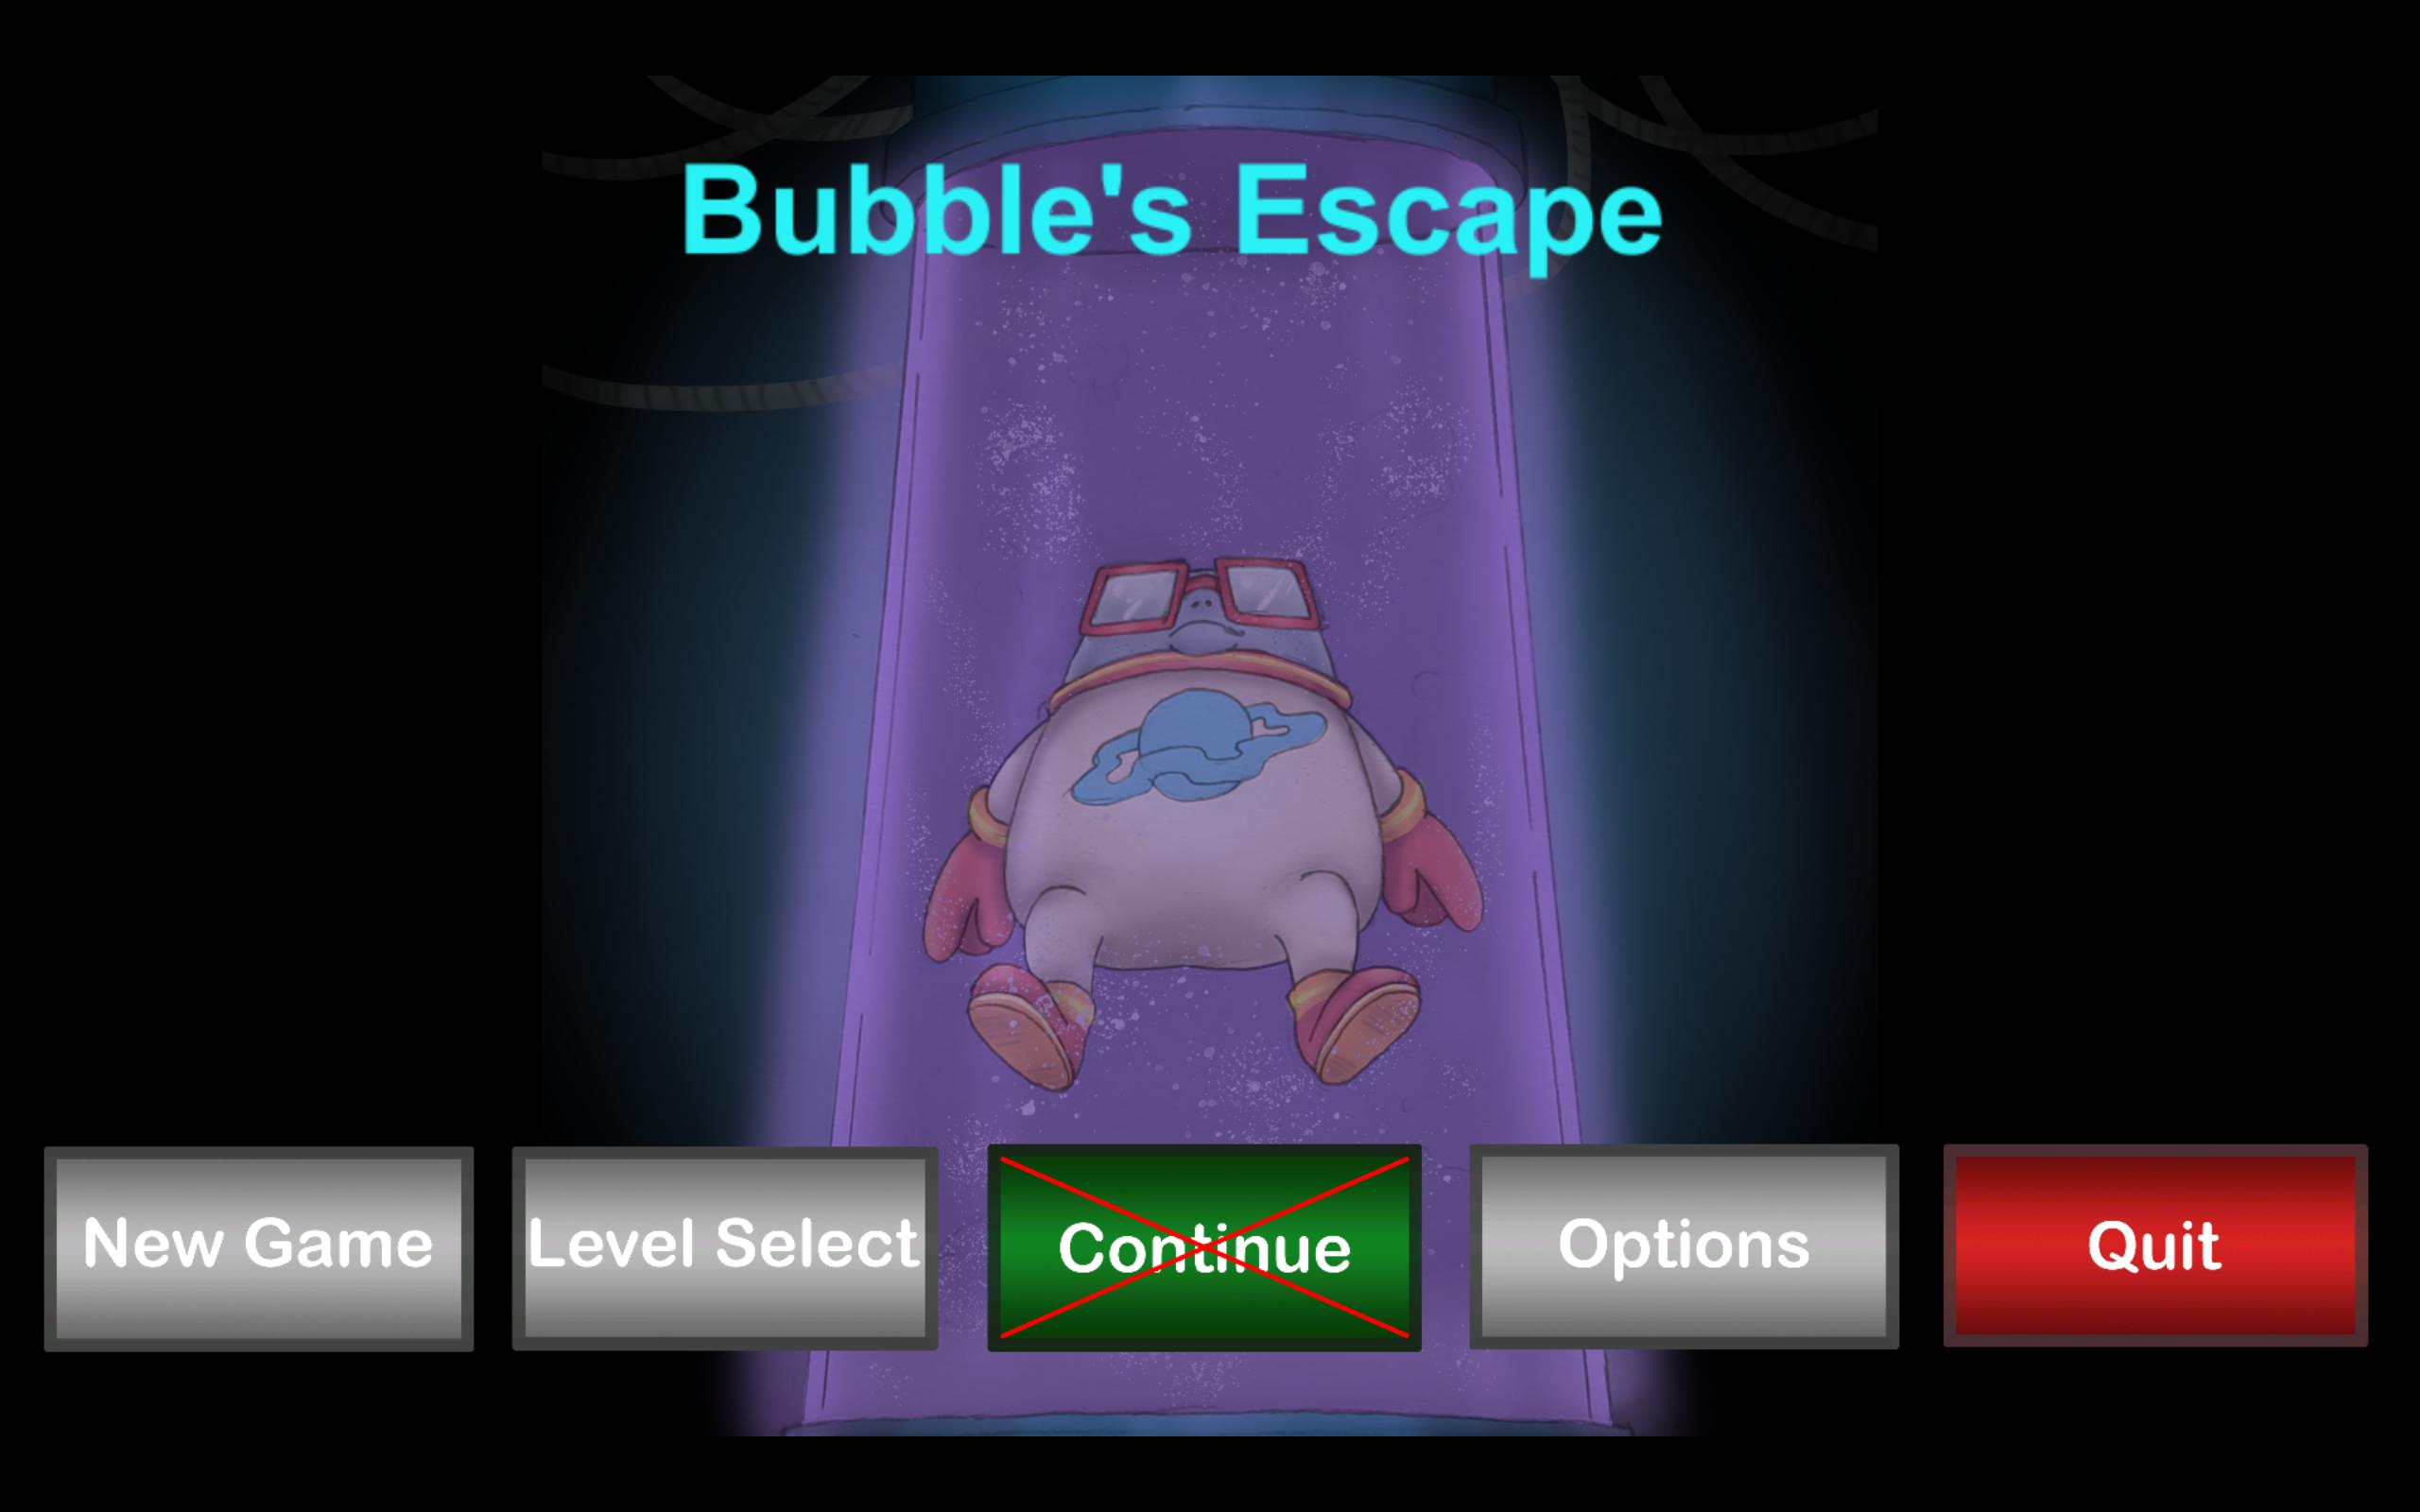 Bubbles Escape Title Screen